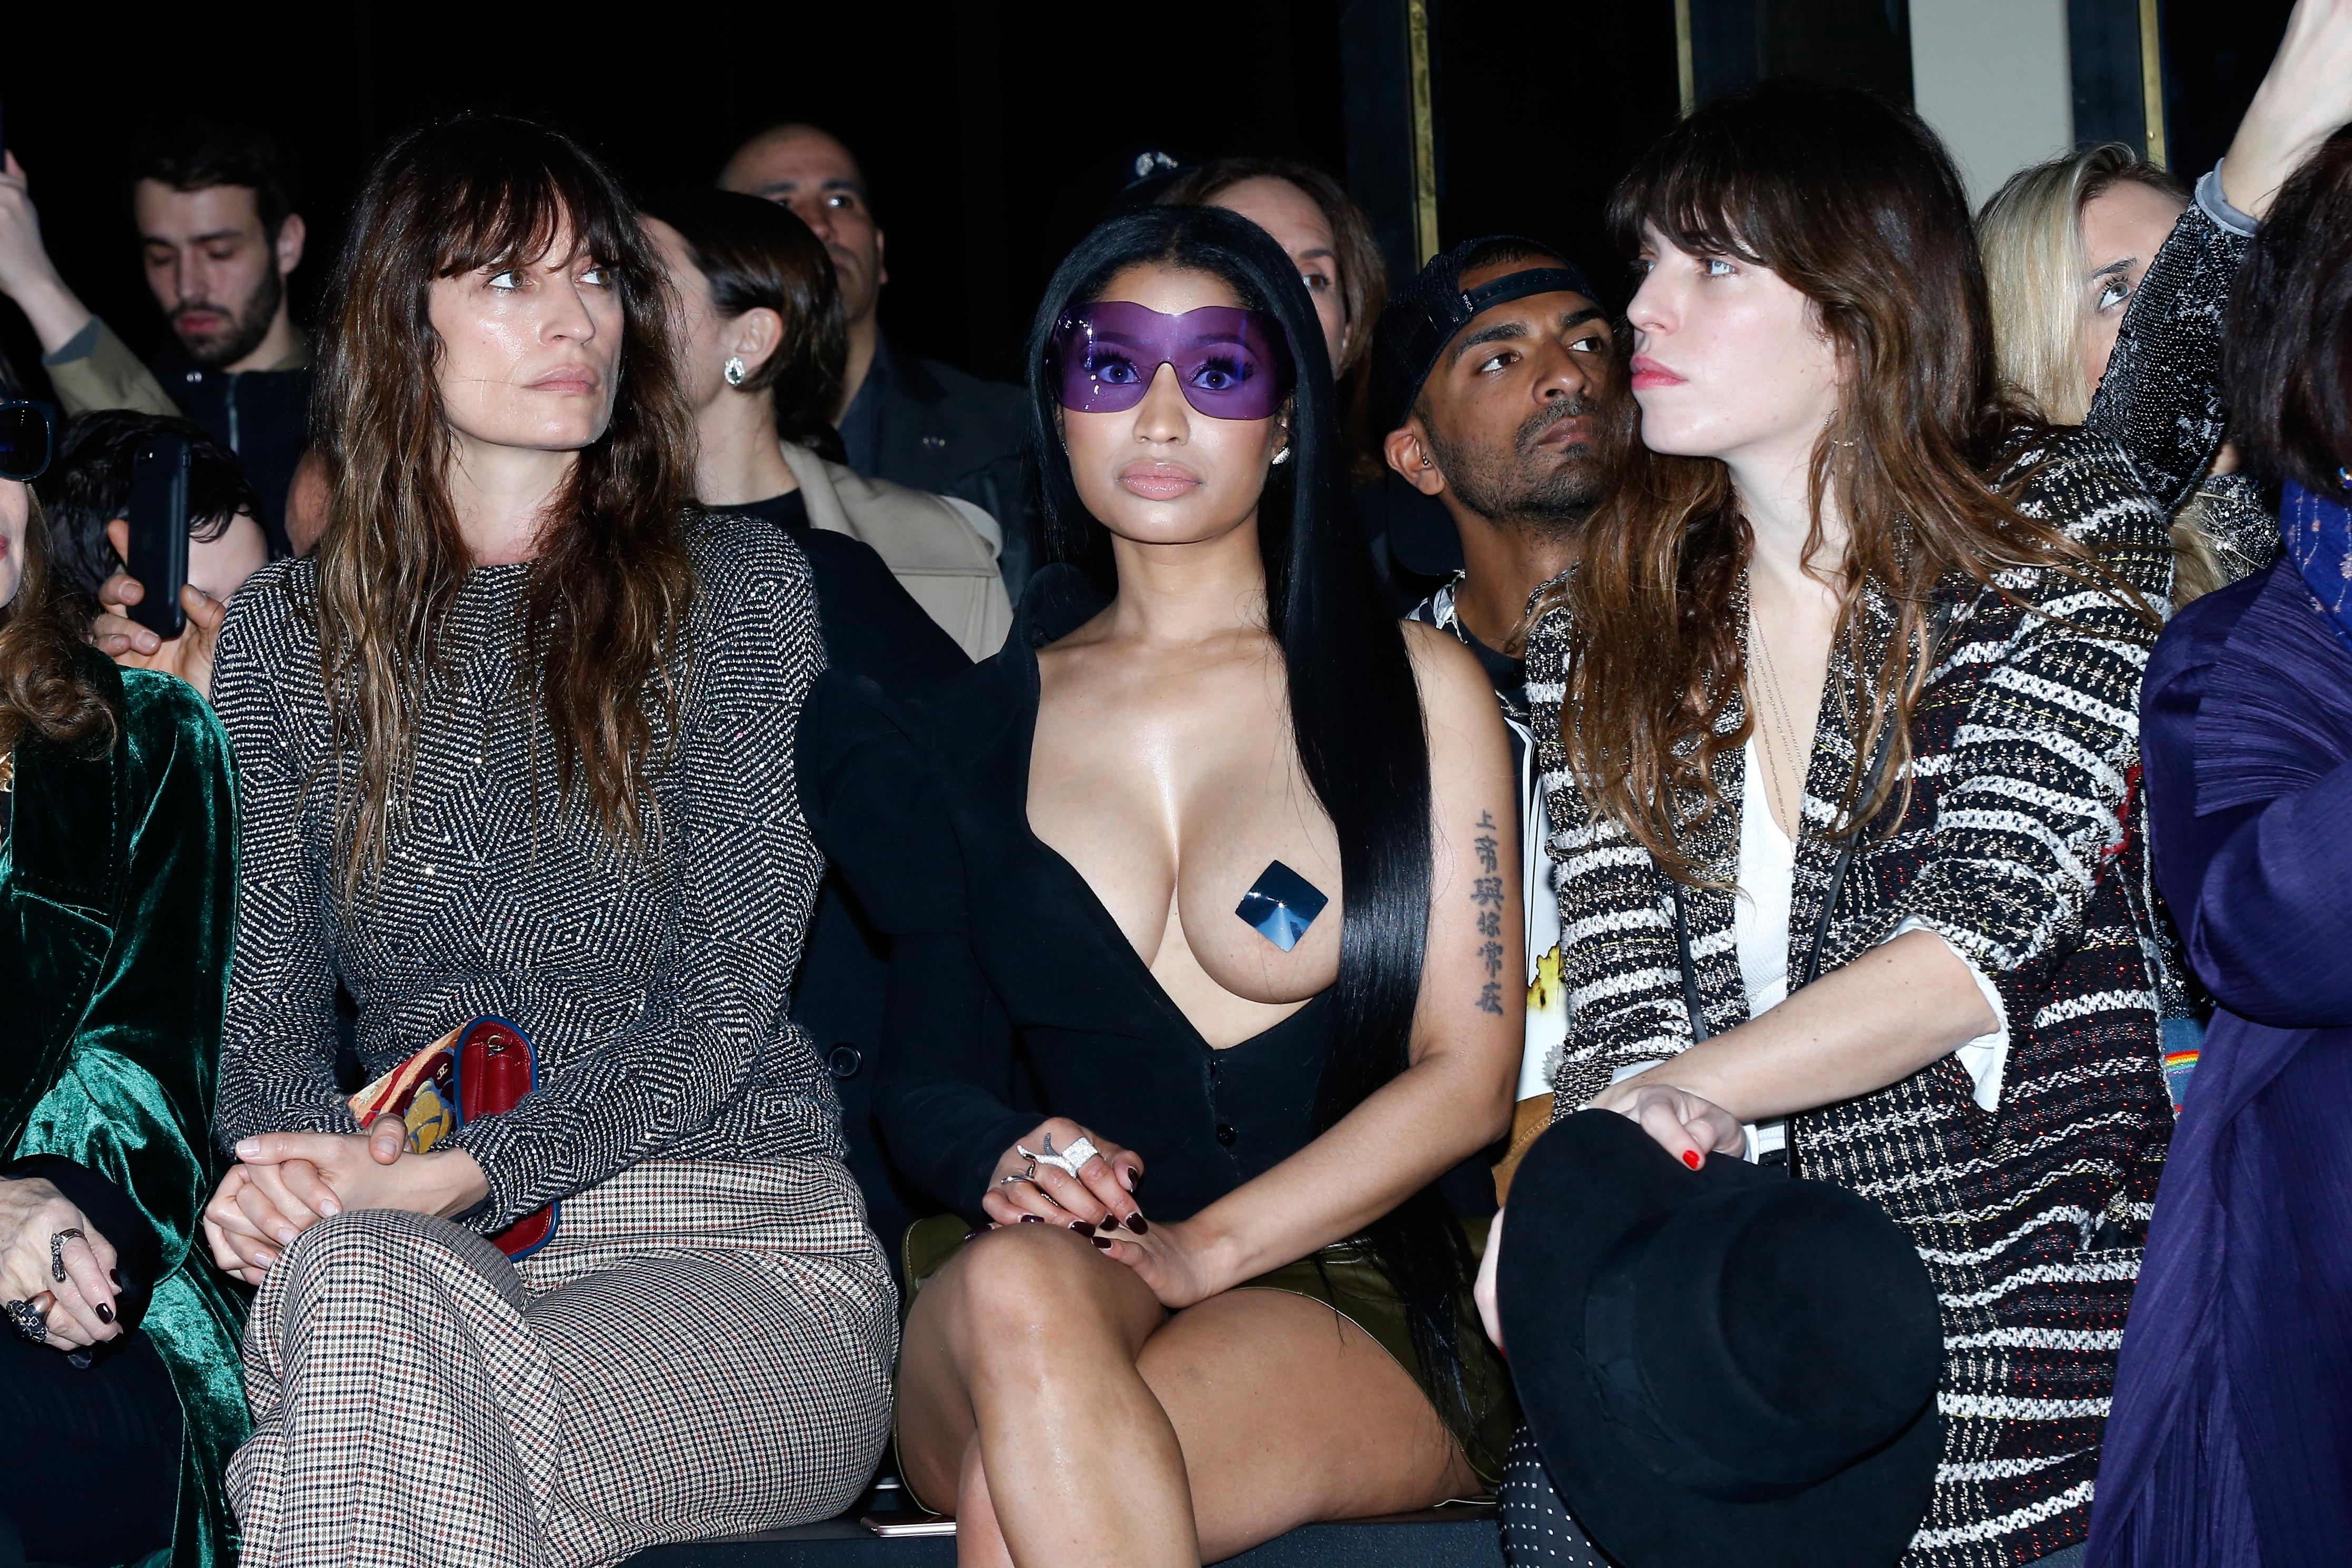 Photos Emma Glover nudes (68 photo), Sexy, Paparazzi, Twitter, panties 2015